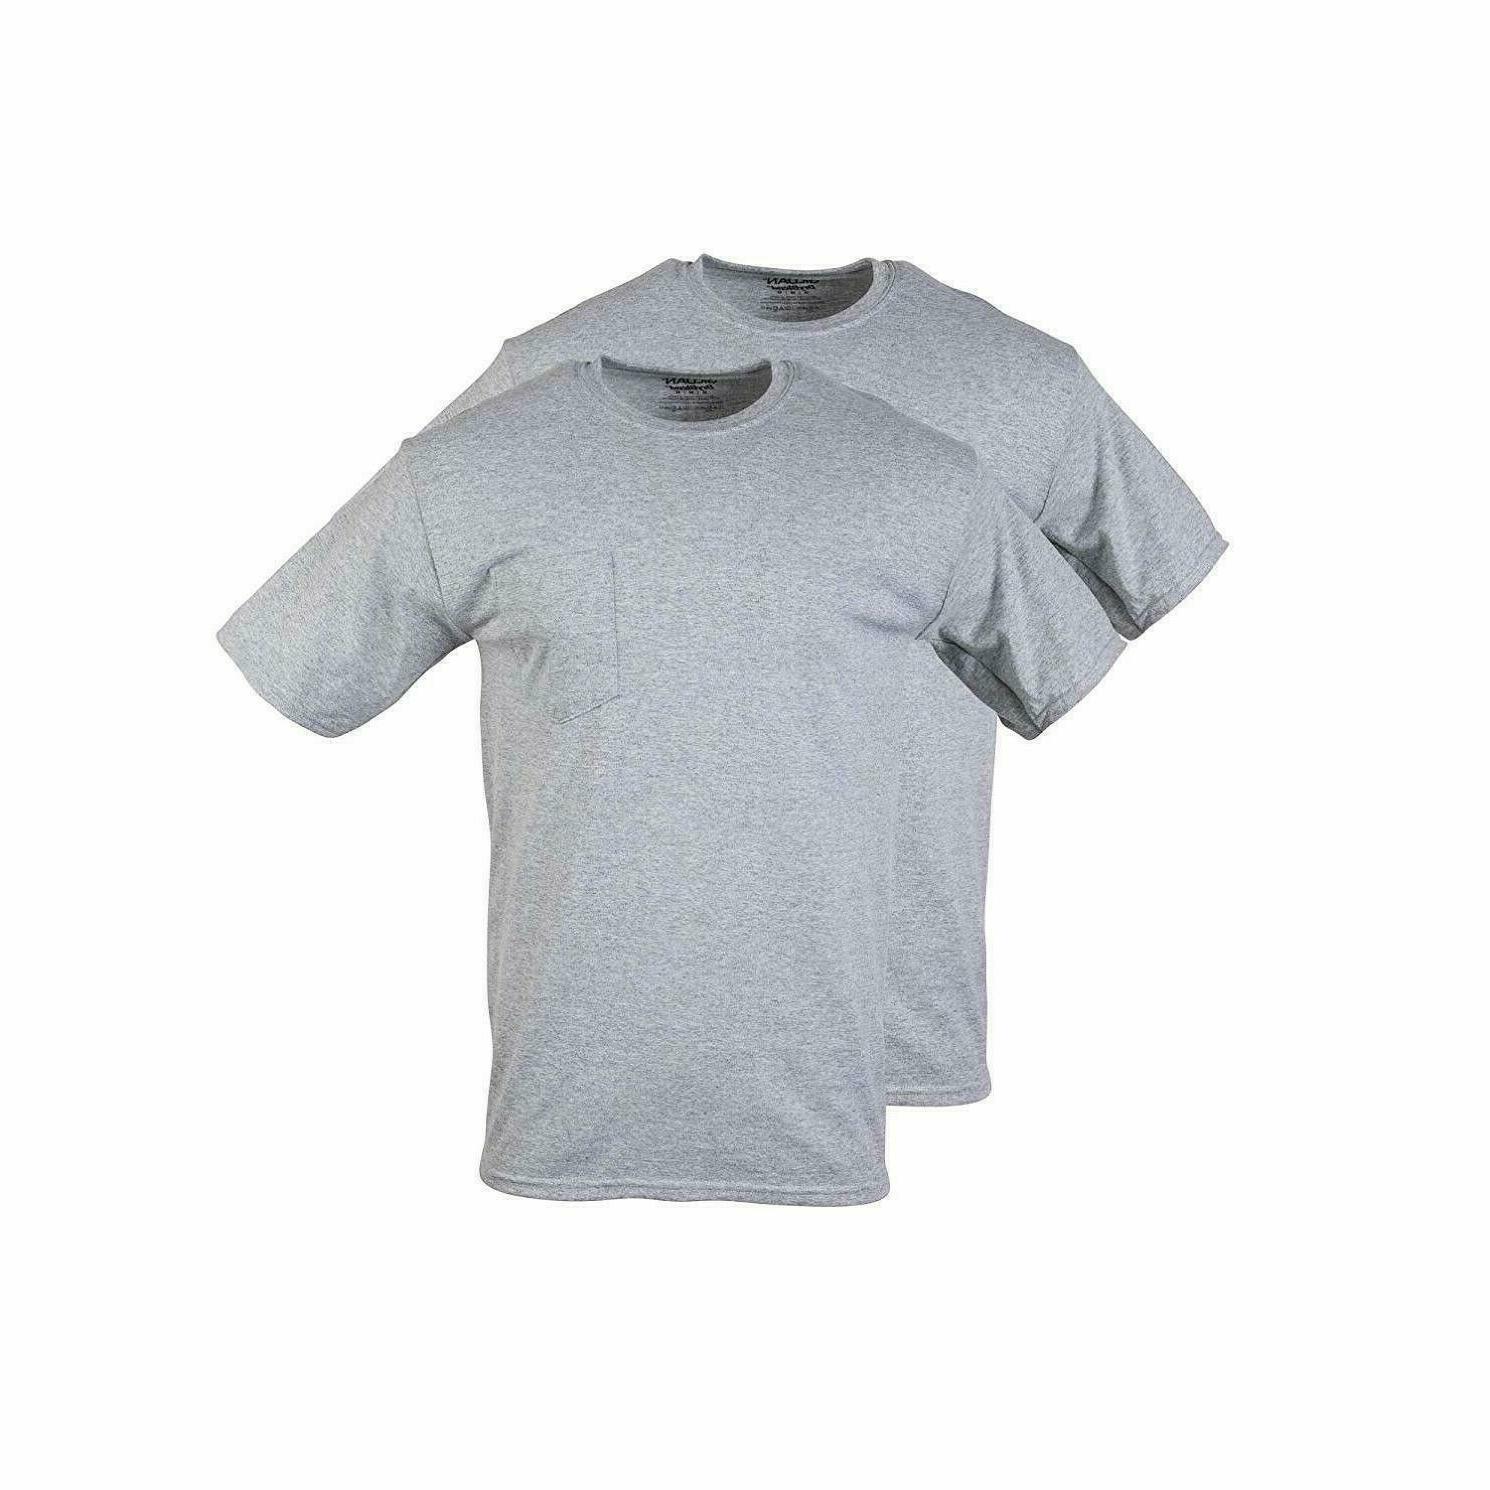 Gildan Men's T-Shirts WorkWear Tall Sizes 2-Pack J5-12